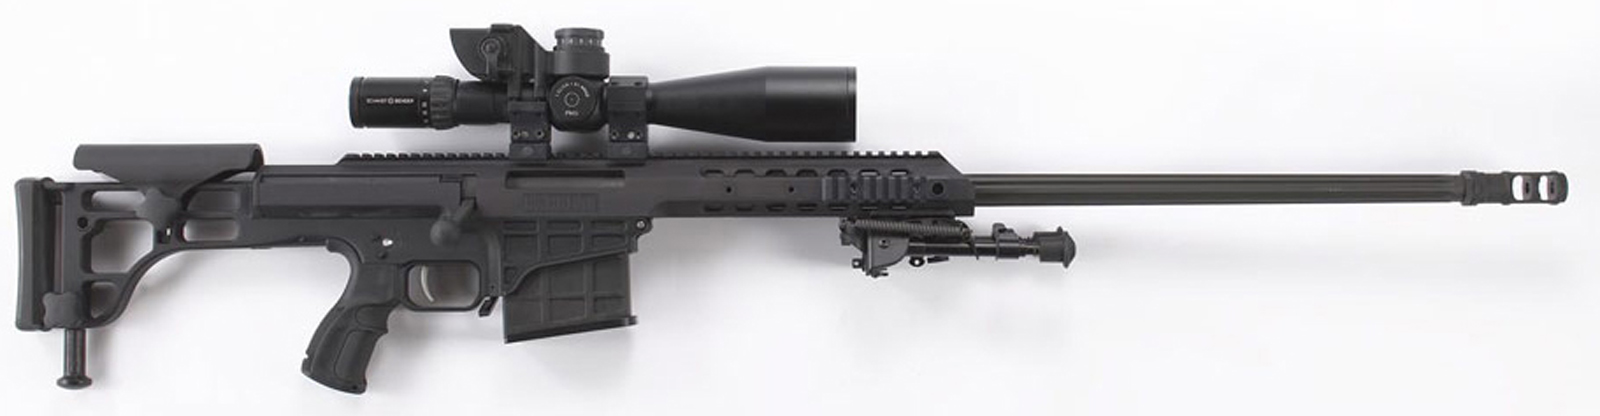 Magnum Sniper Rifle Wallpaper